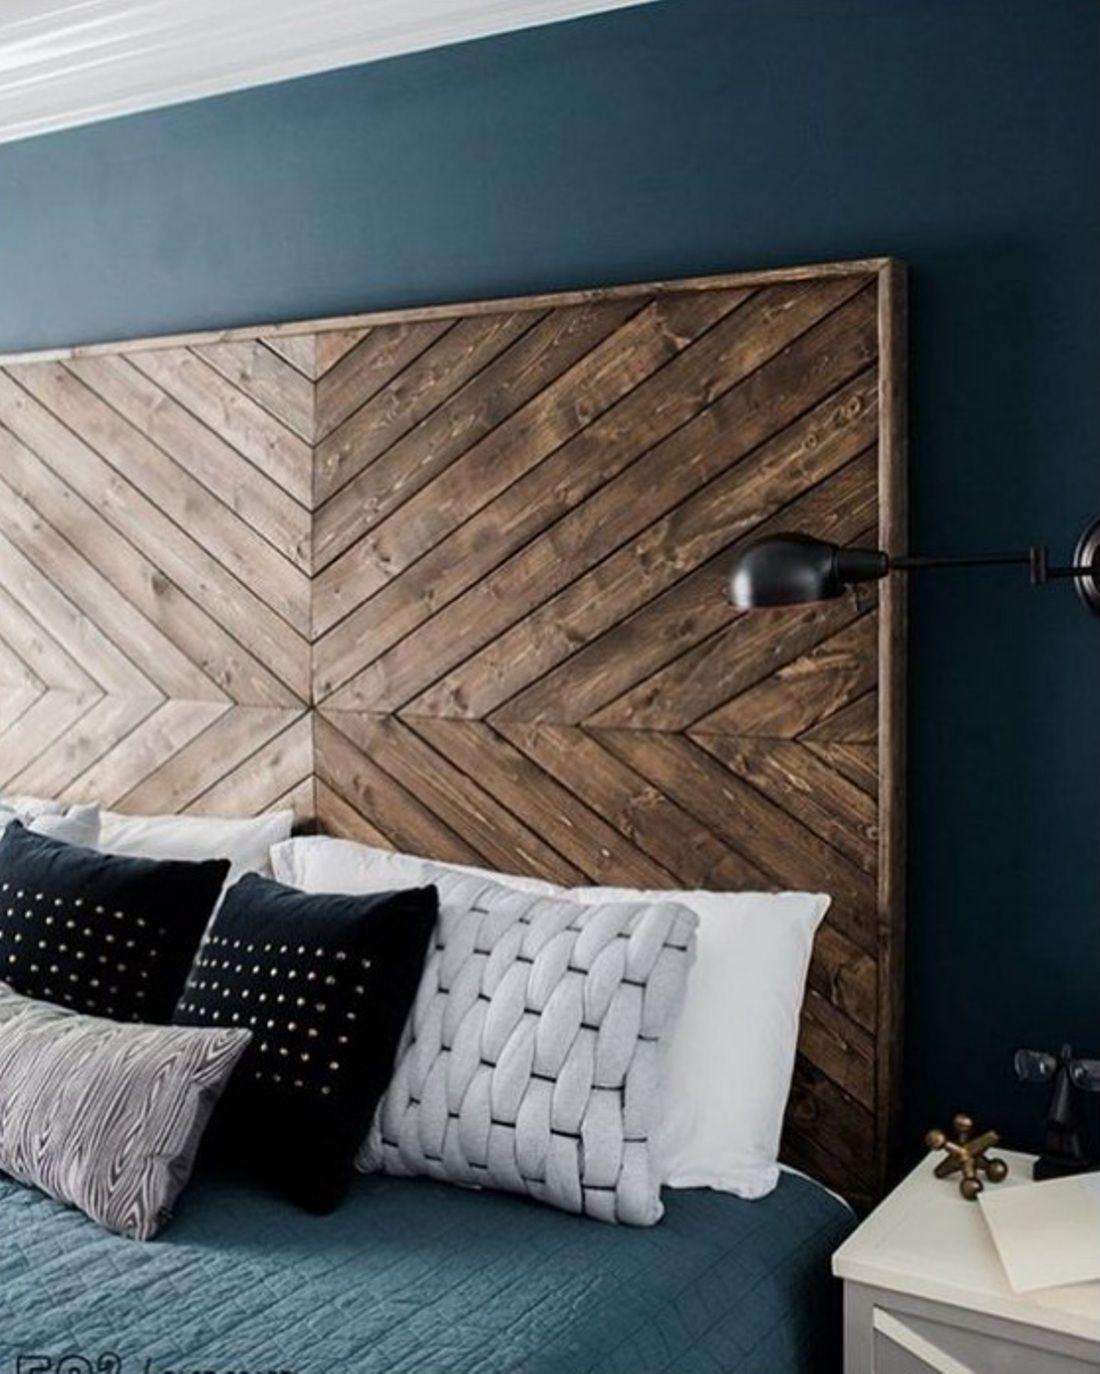 Easy Headboard Ideas Part - 38: 5 Easy DIY Headboard Ideas You Should Try U2013 My Home Decor Guide